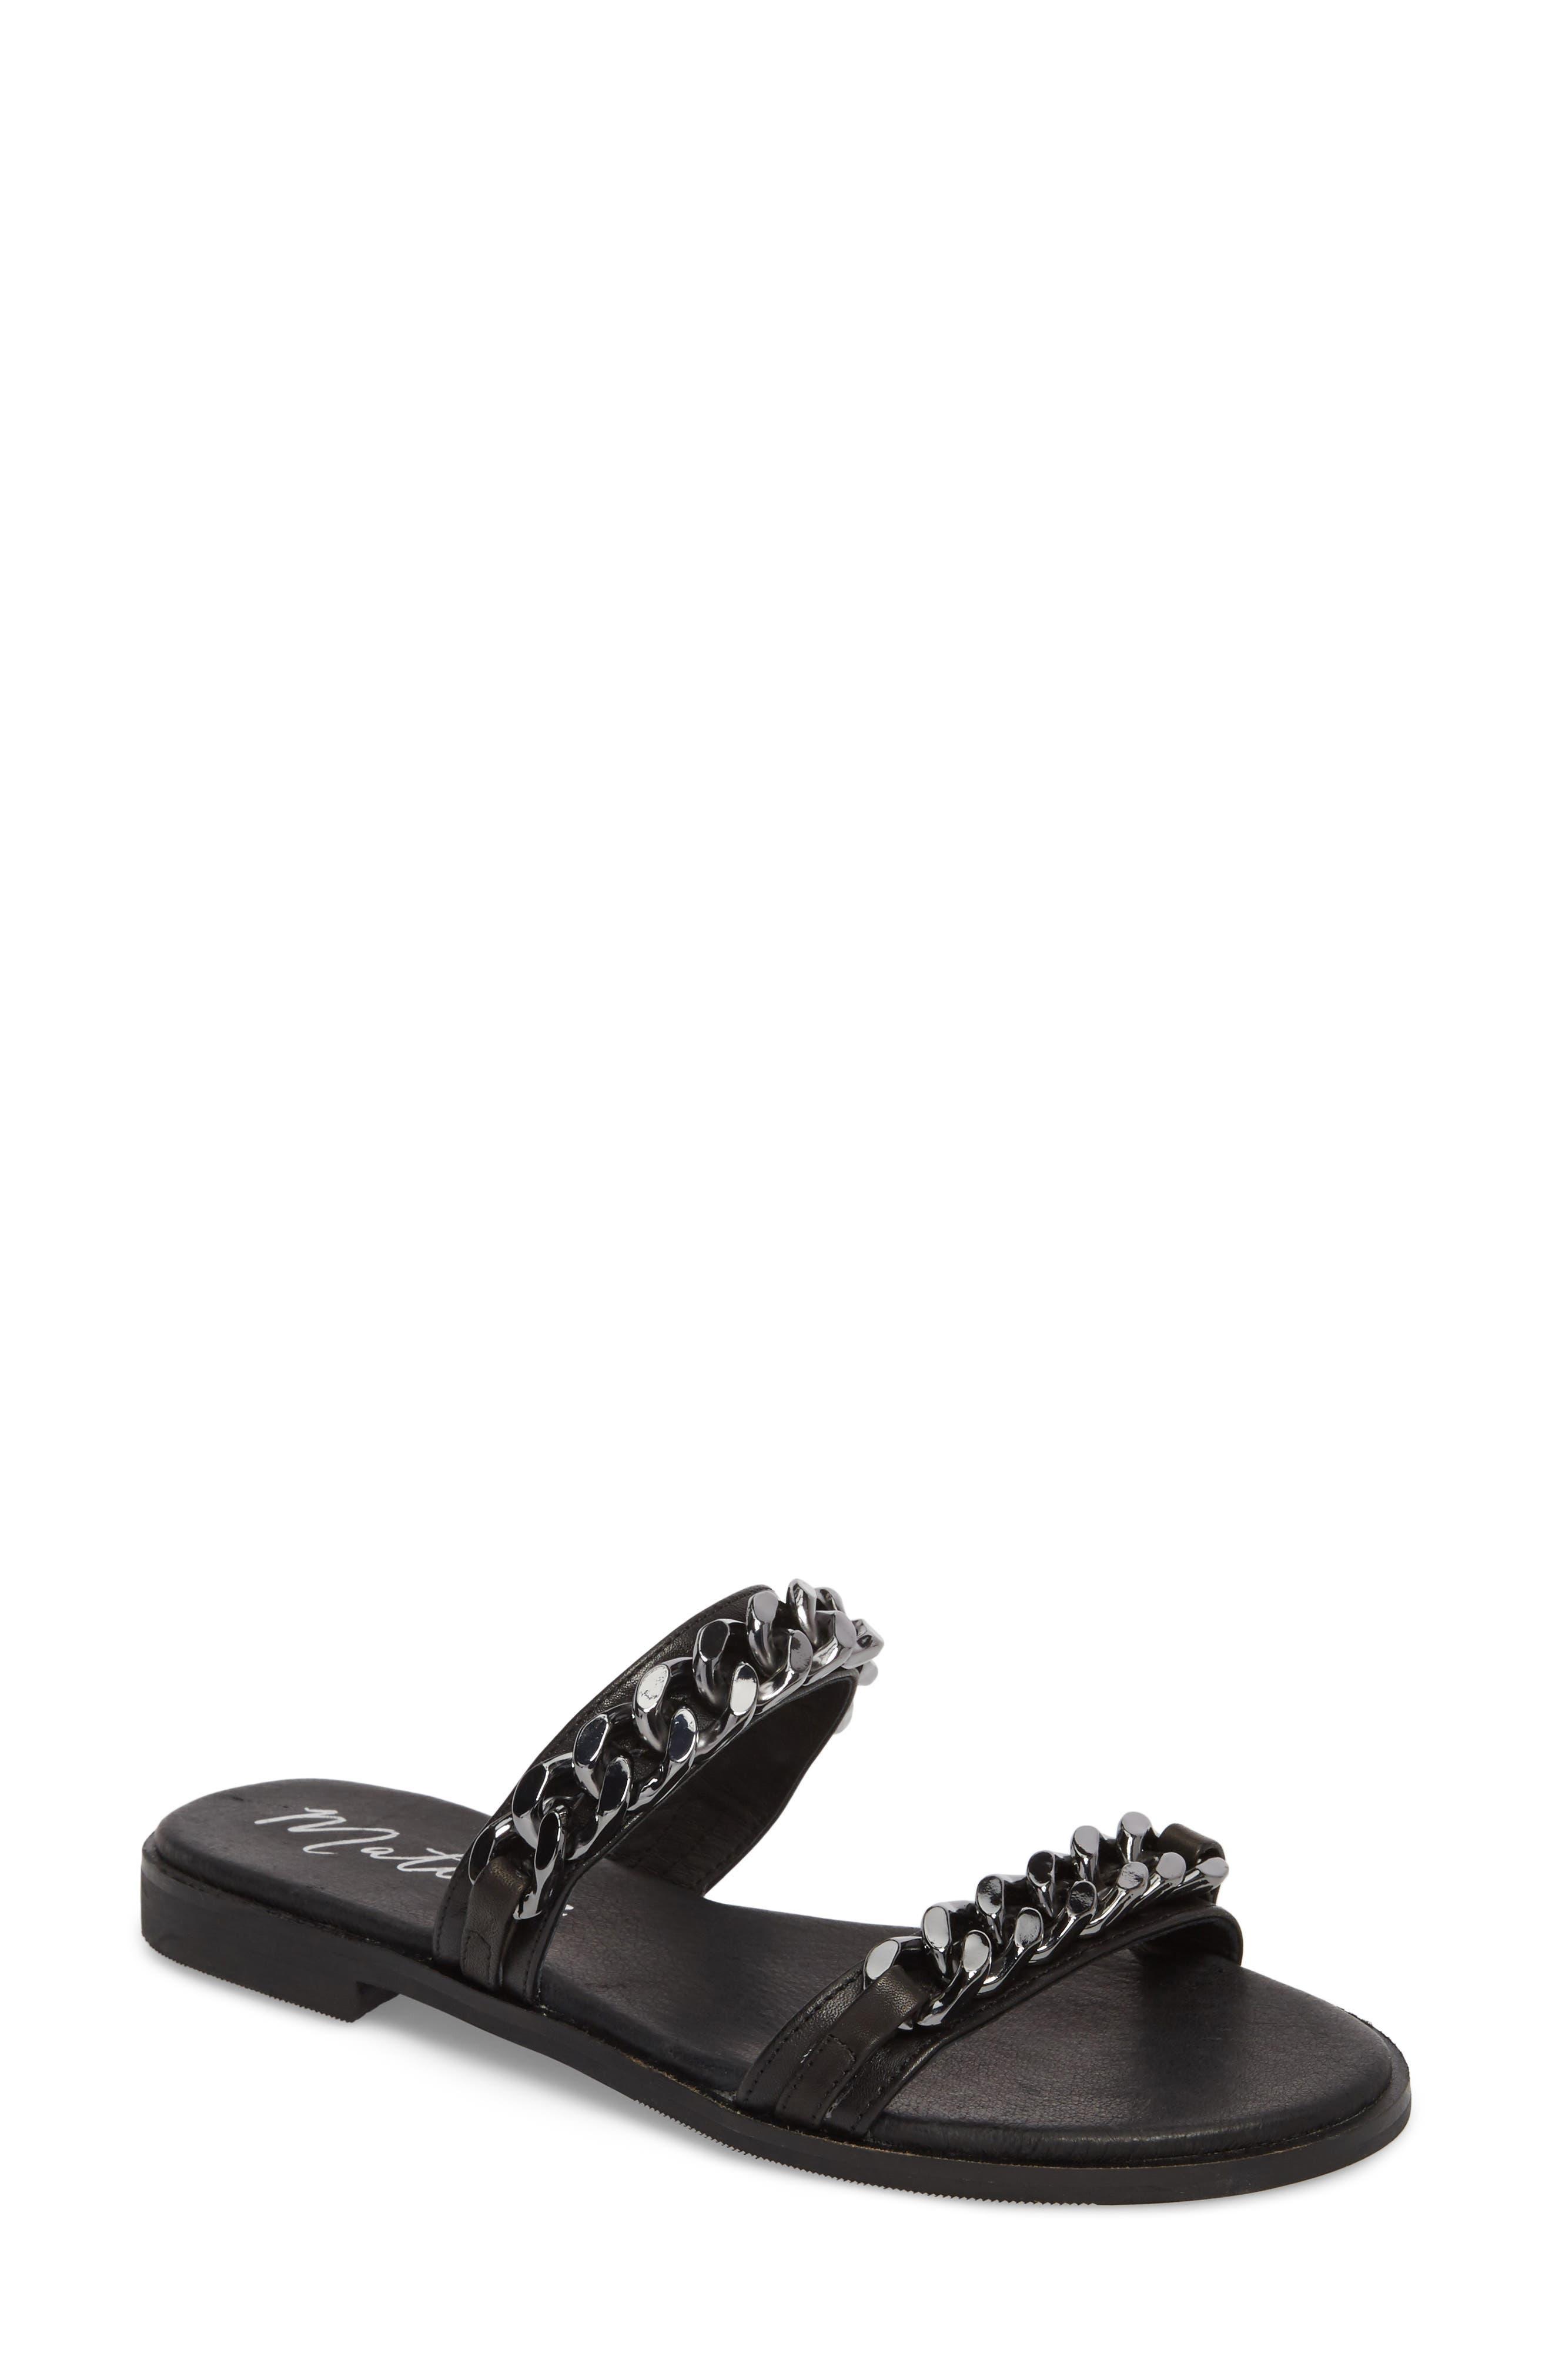 Alternate Image 1 Selected - Matisse Reagon Sandal (Women)